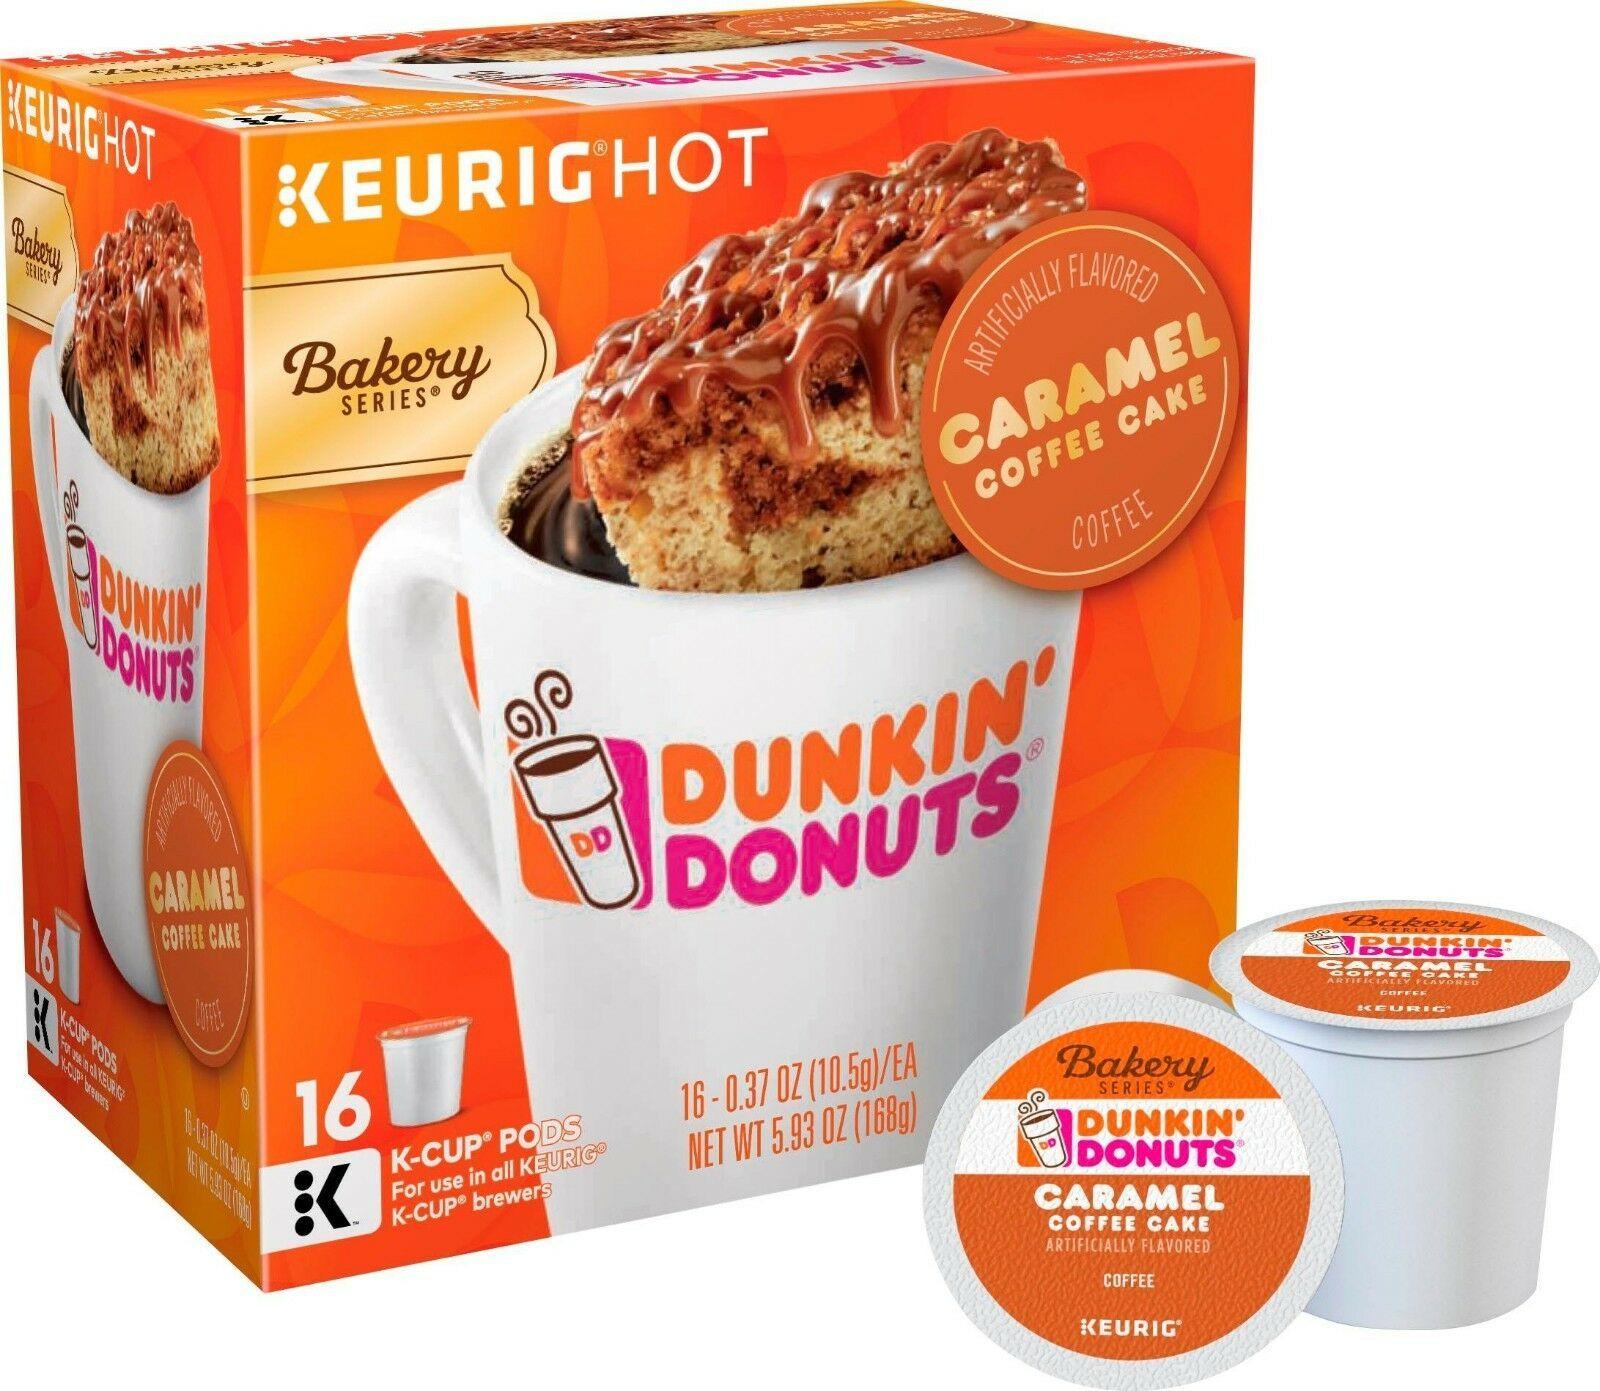 Dunkin Donuts Caramel Coffee Cake Coffee 16 to 96 Keurig K